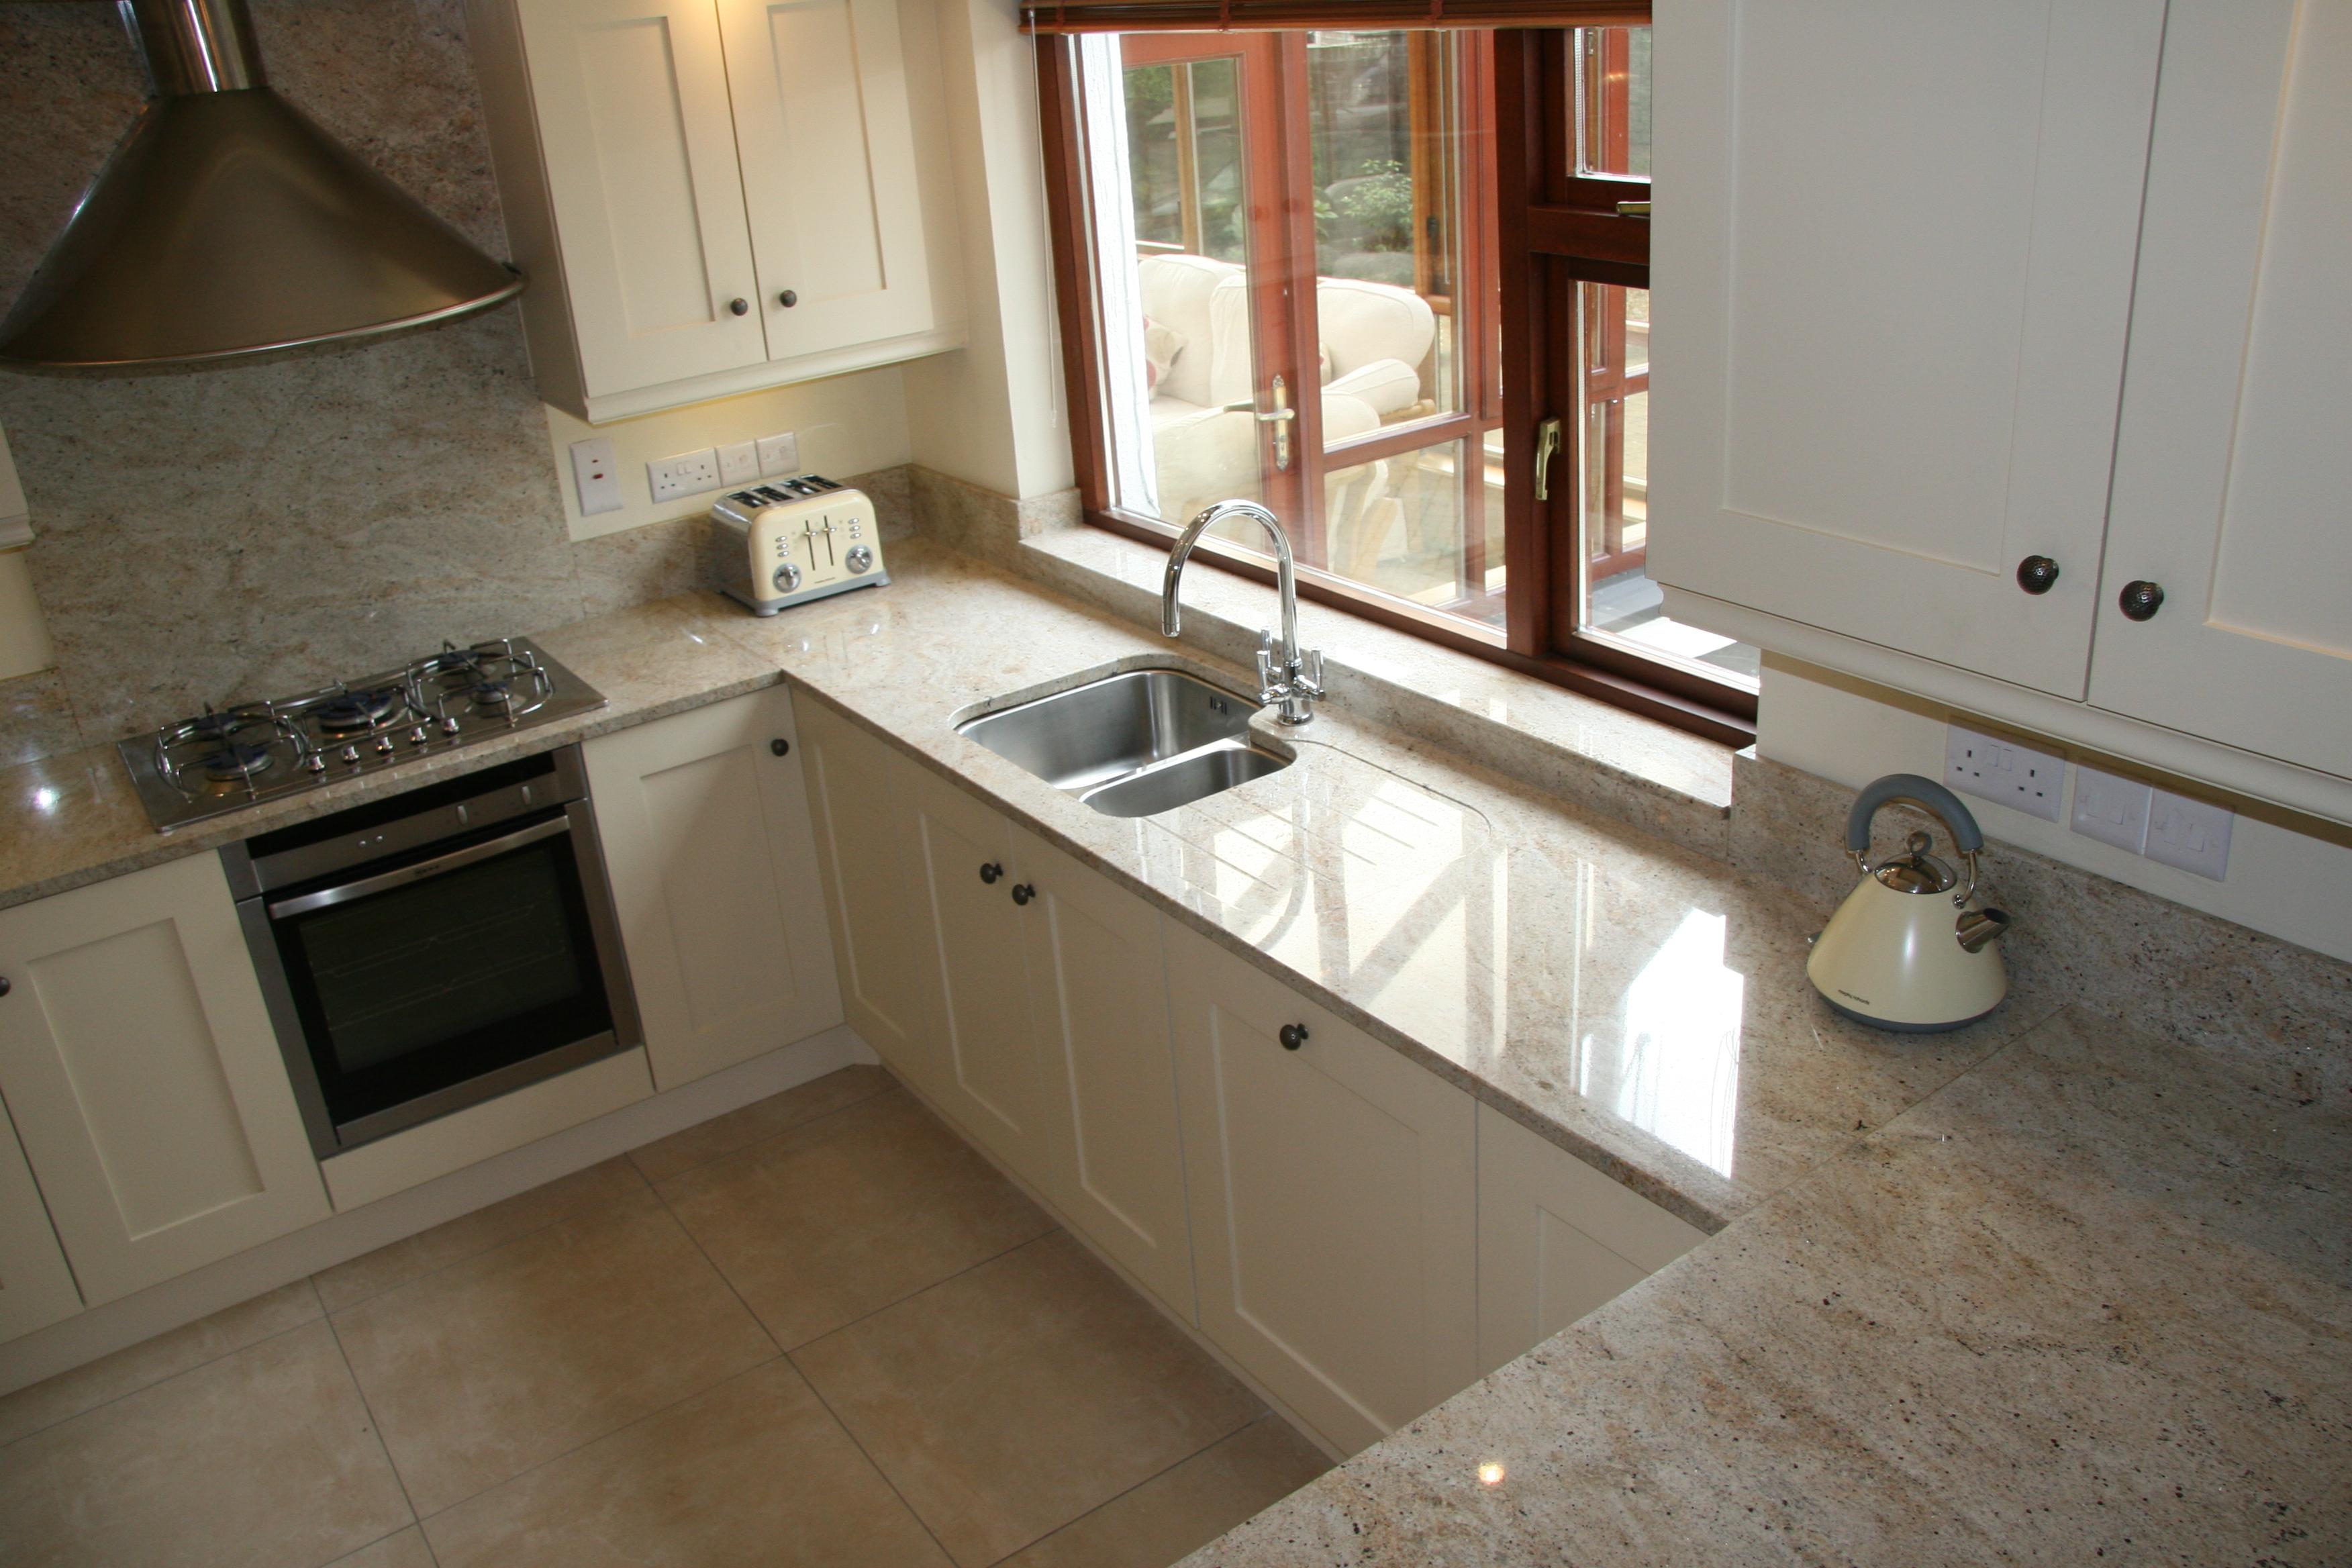 Granite kitchen worktop 2012-10-01 12.34.08 DJHZXSC